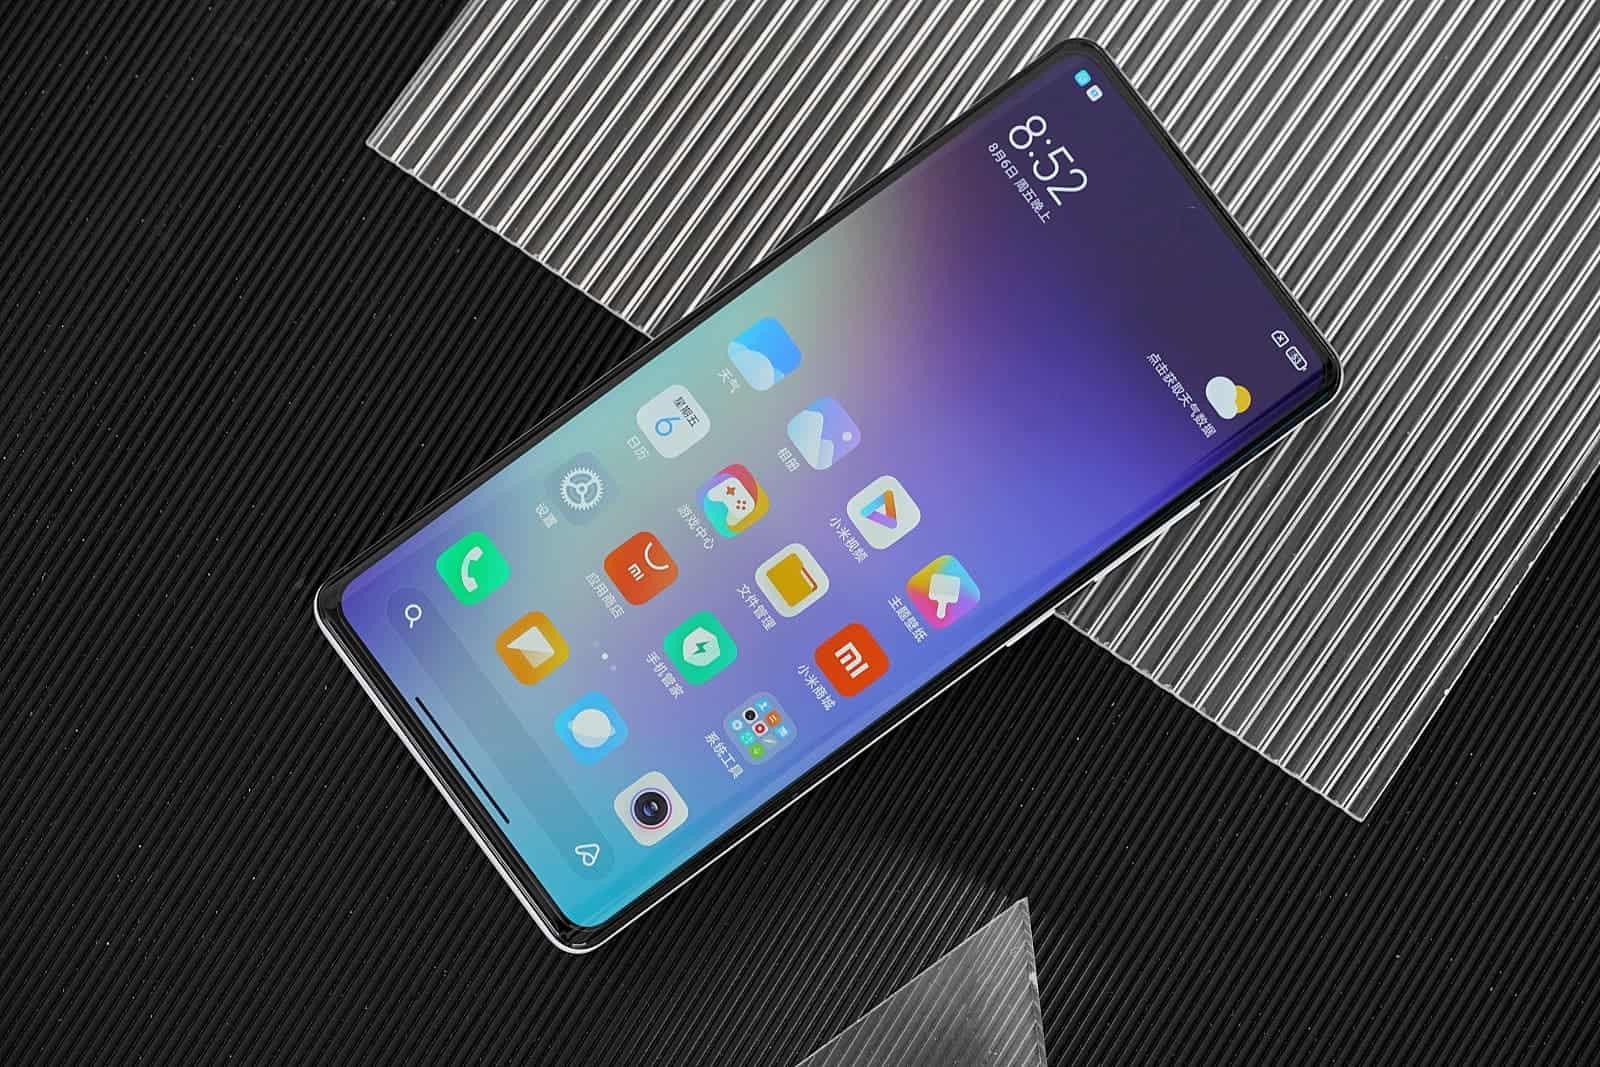 Xiaomi Mi MIX 4 under-screen cameras